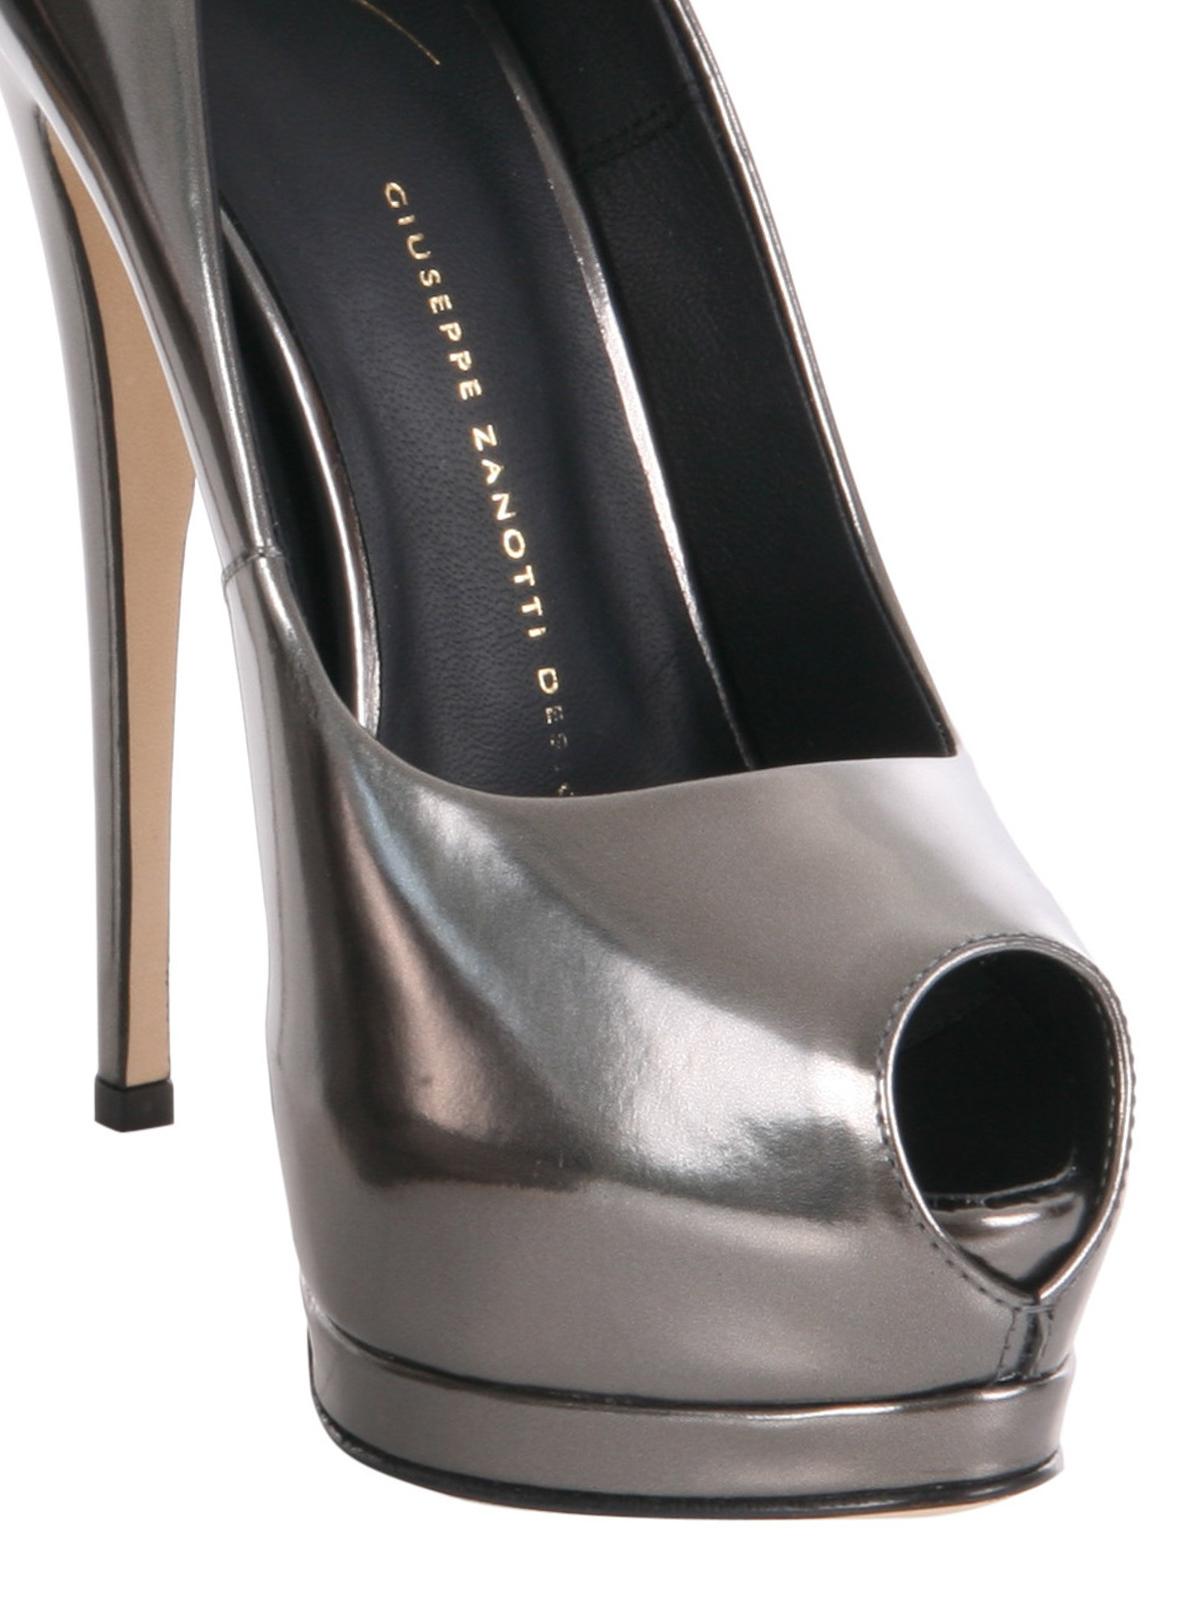 a49bf9f8d39f3 Giuseppe Zanotti - Super Sharon court shoes - court shoes - I66007 007